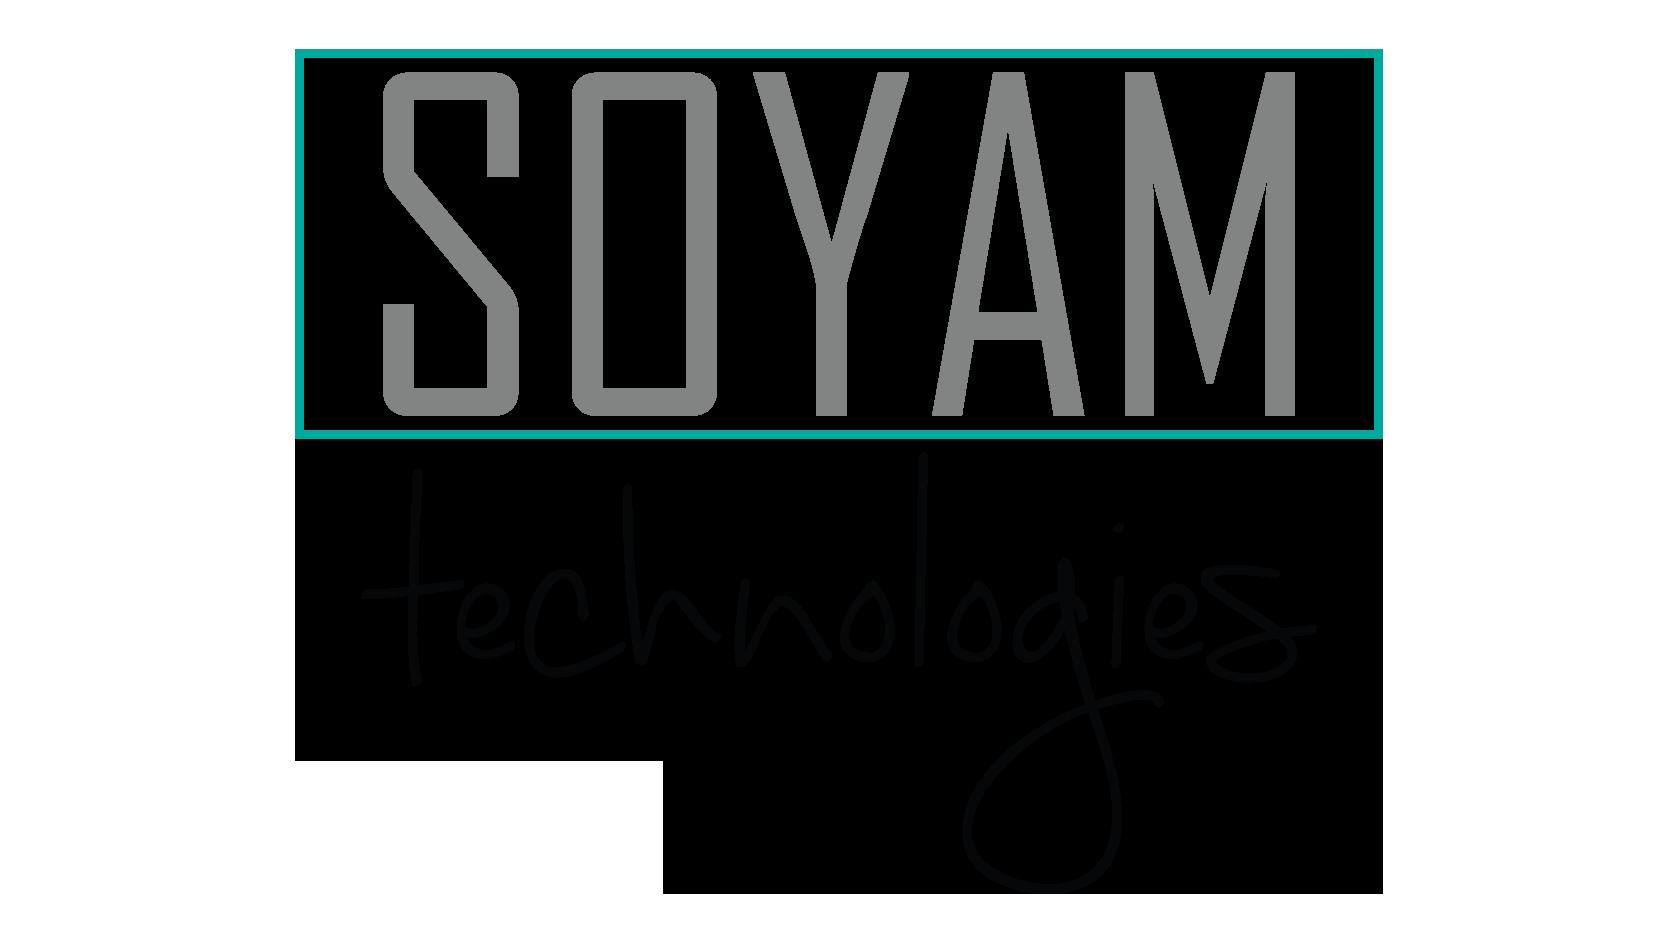 SOYAM